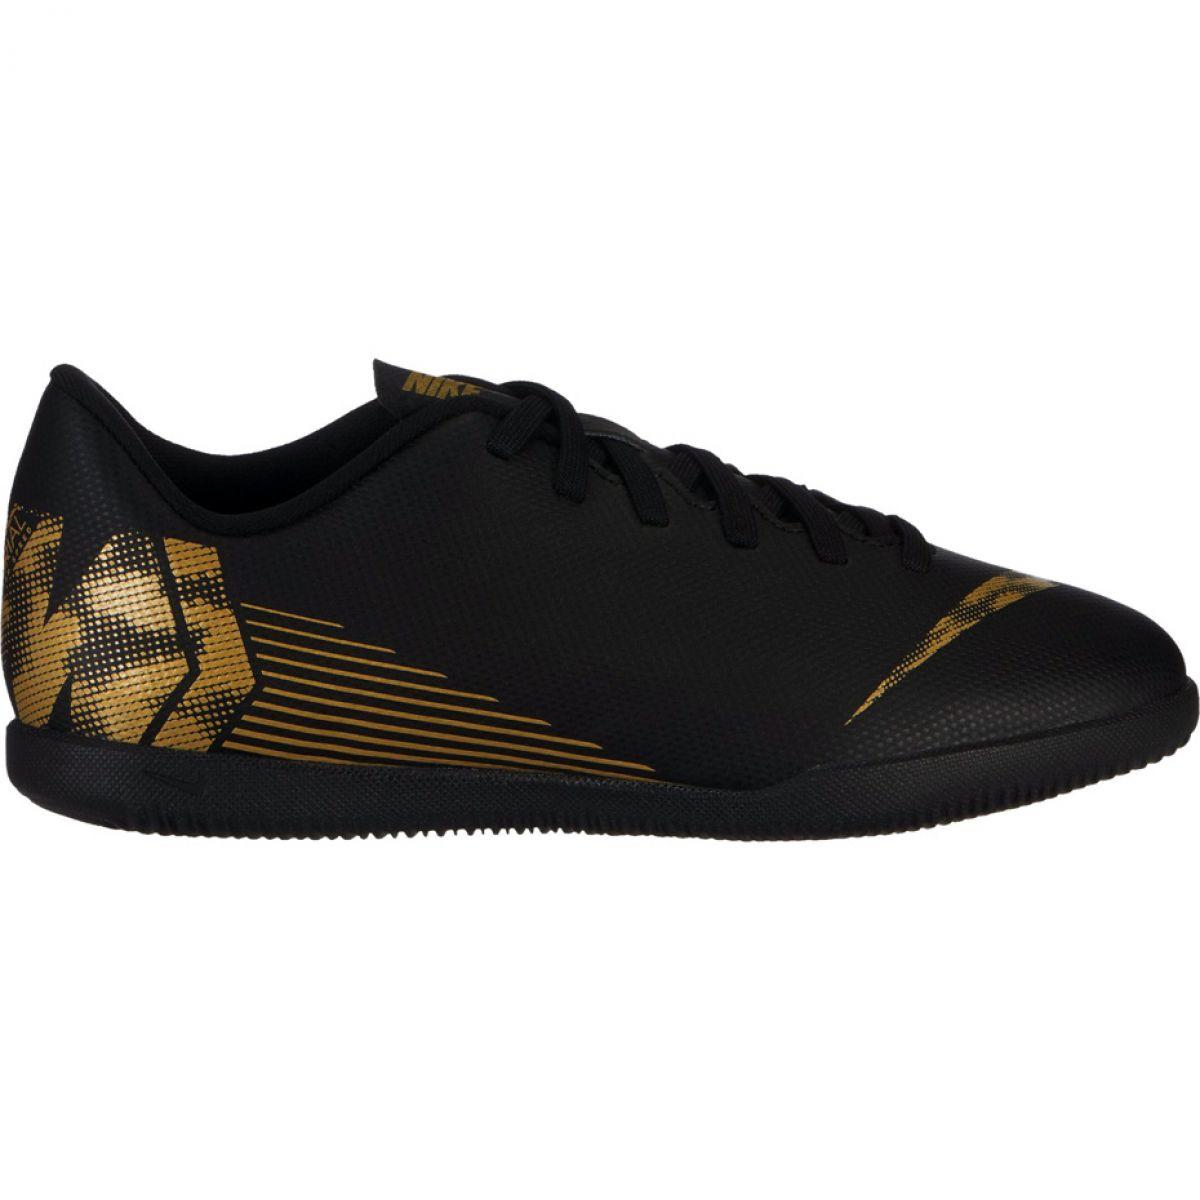 sale retailer 34cda 9ce24 Hallenschuhe Nike Mercurial Vapor X 12 Club Ic Jr AH7354-077